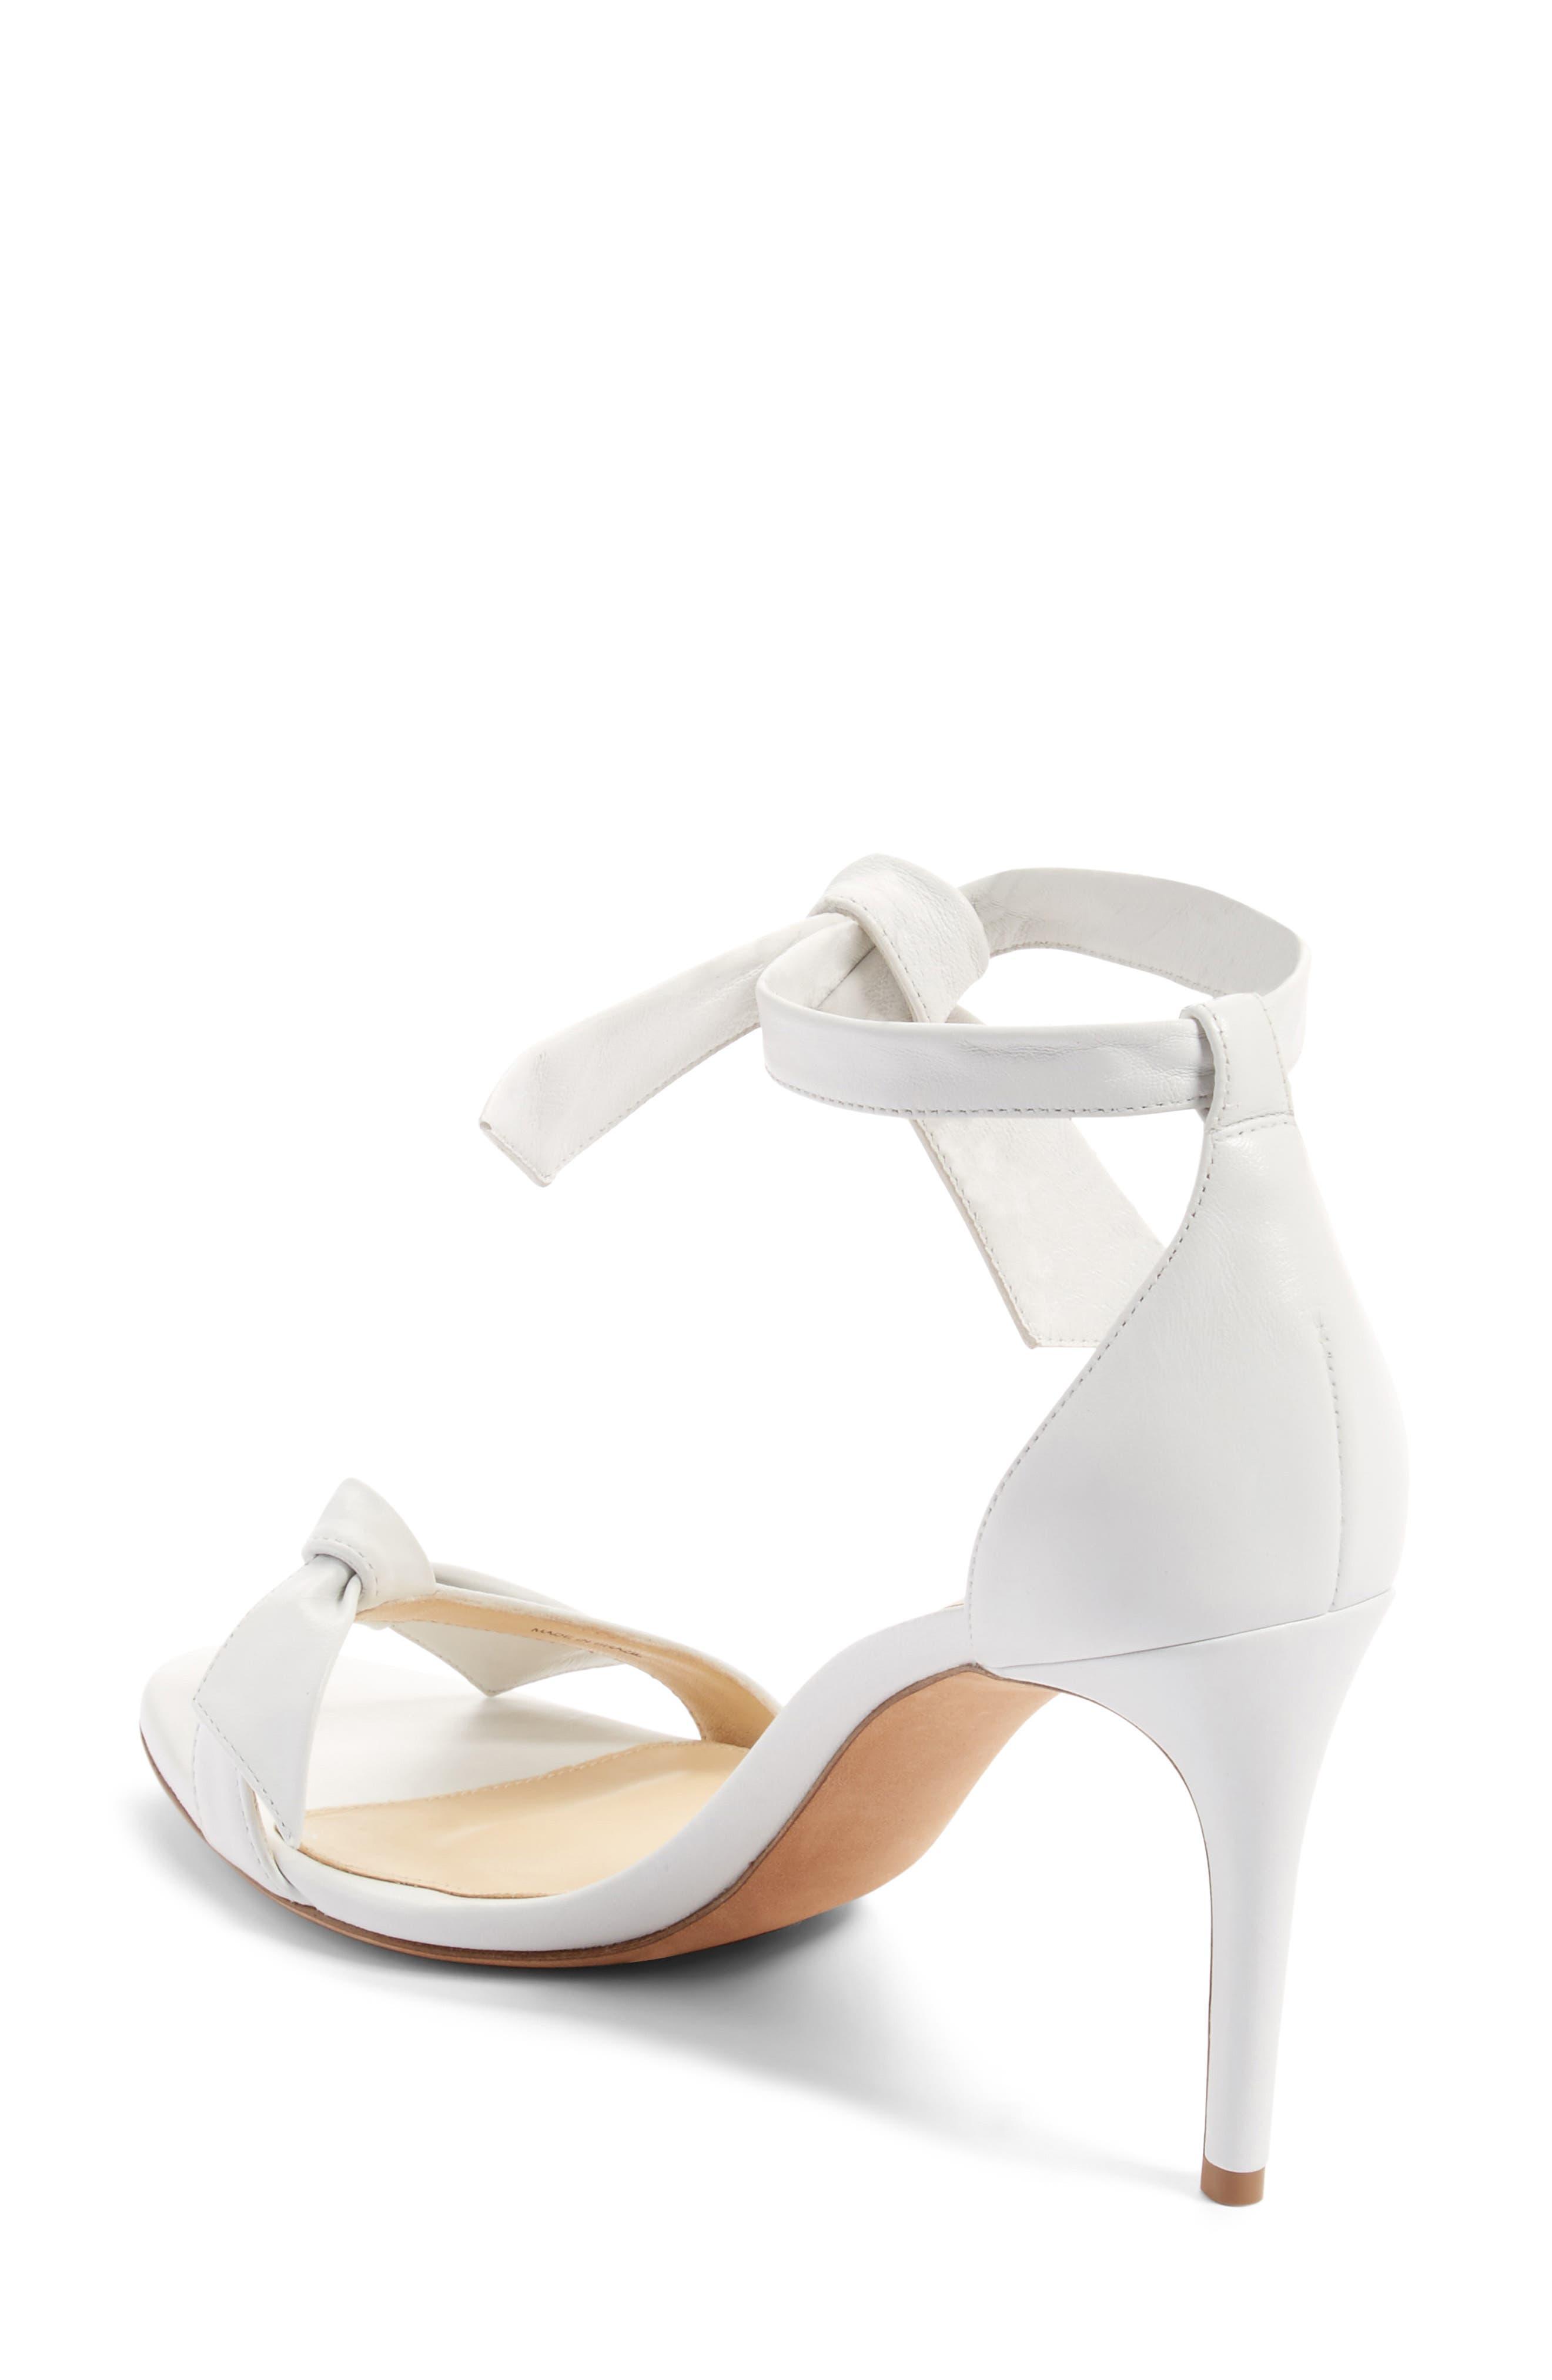 Clarita Ankle Tie Sandal,                             Main thumbnail 1, color,